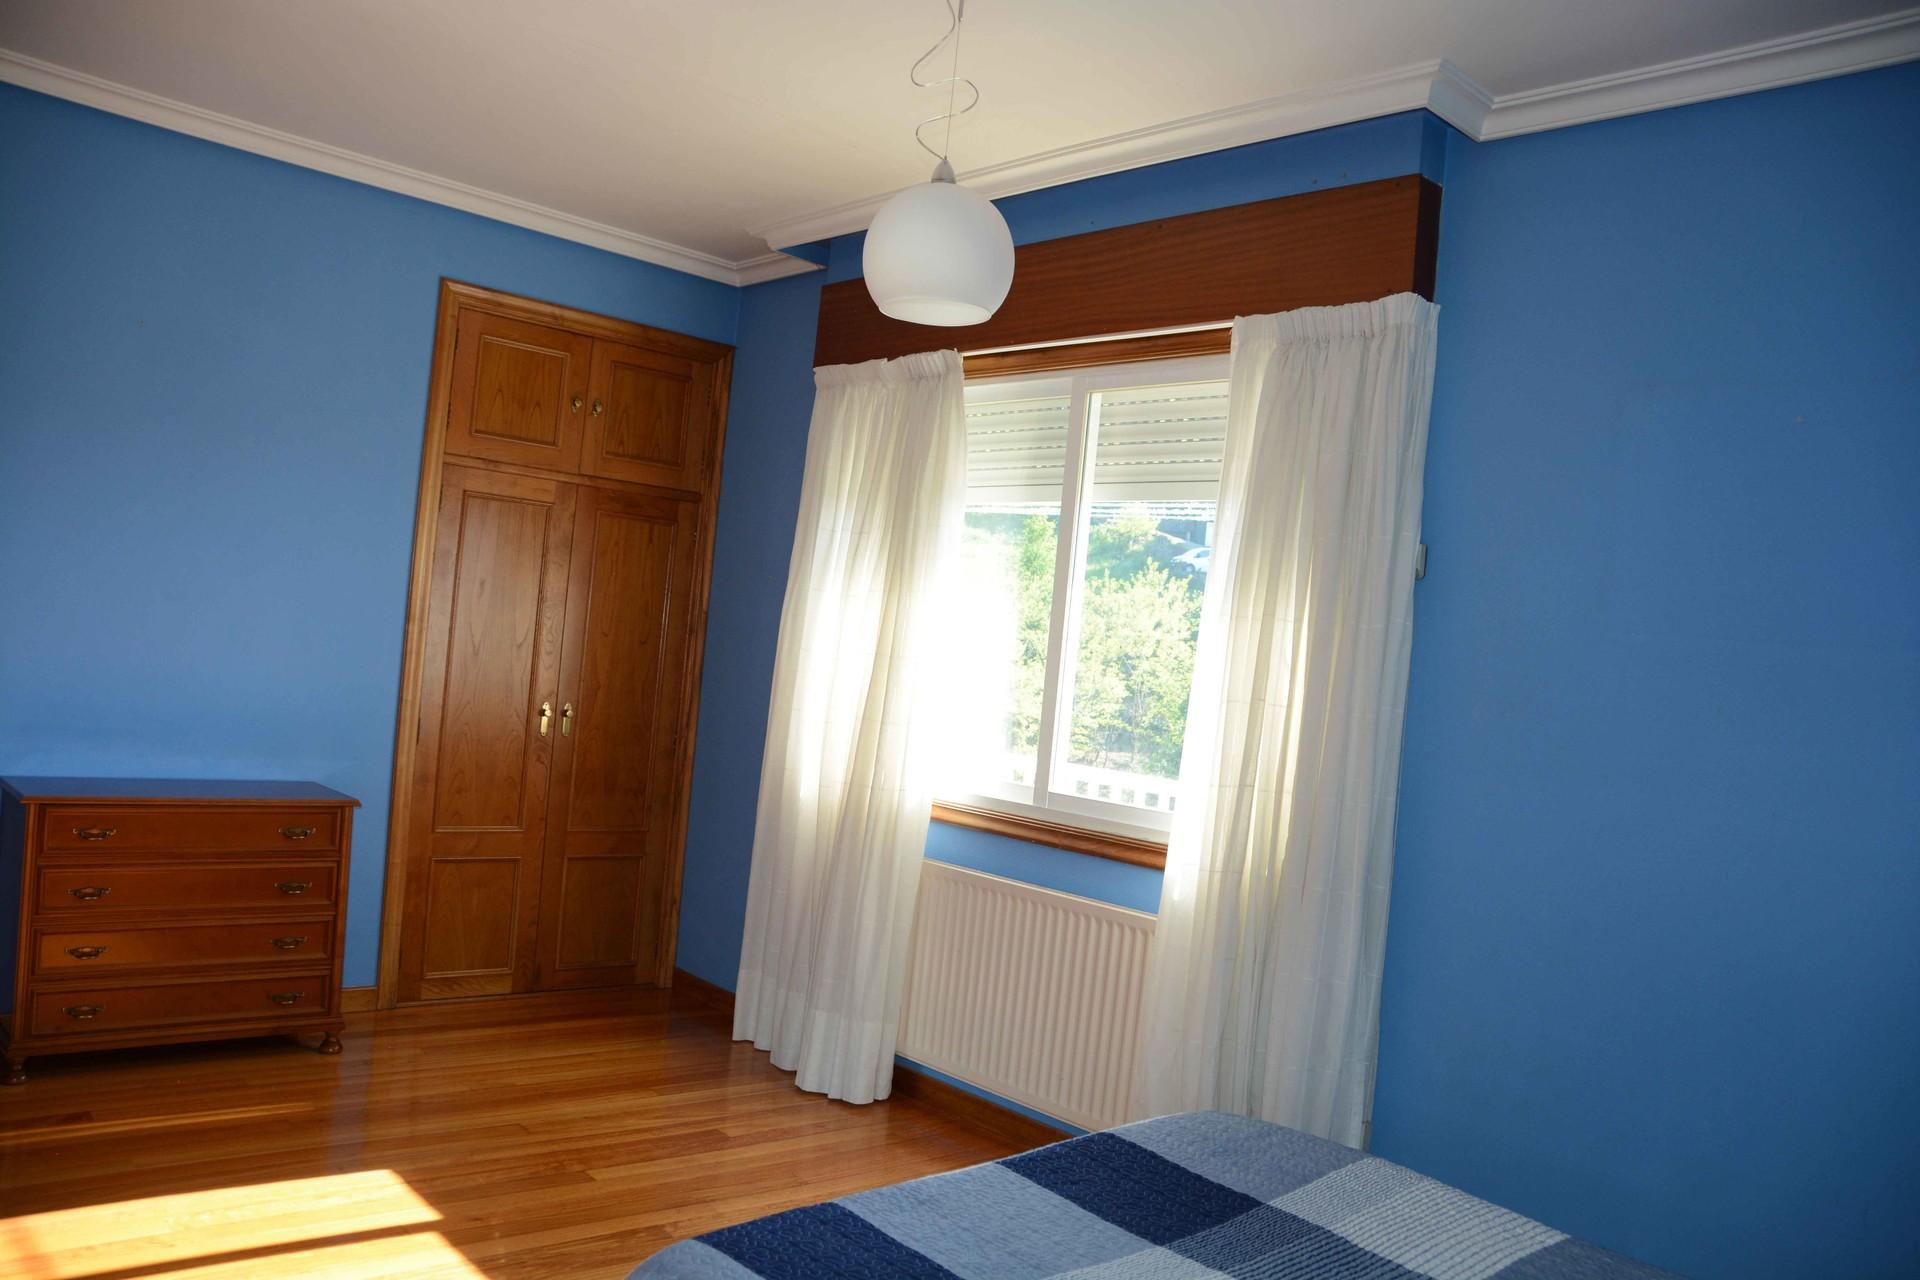 Rooms for Erasmus of the University of Vigo